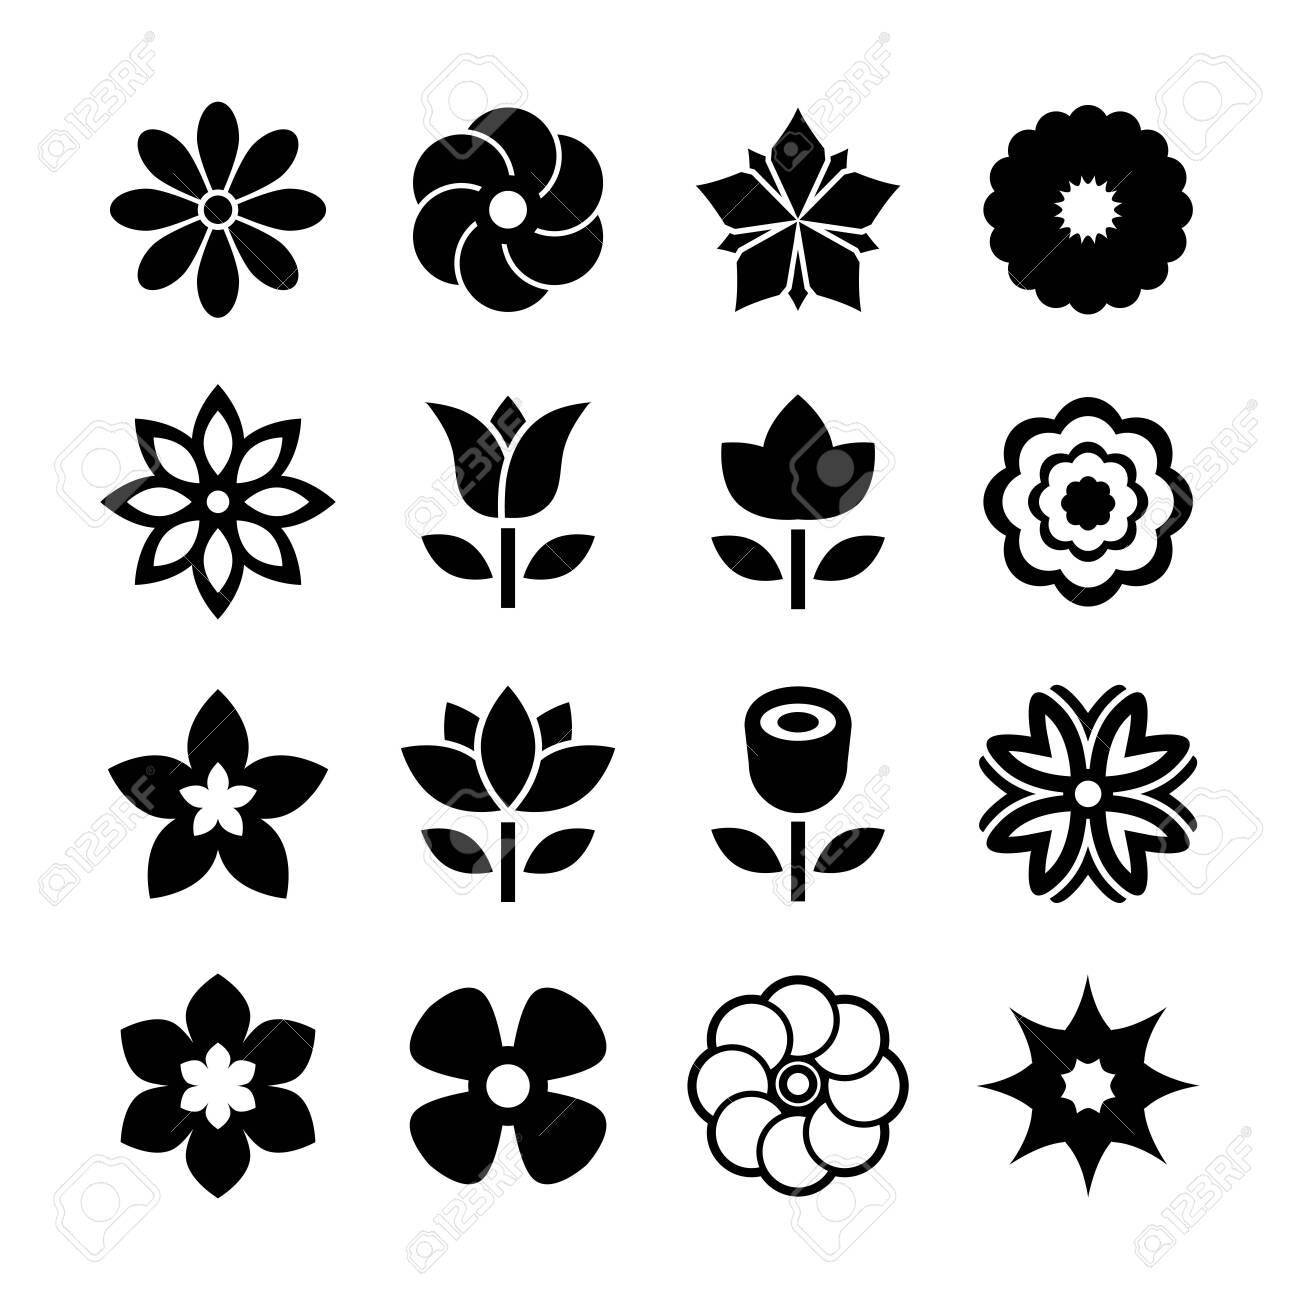 Flower icon - 138034074